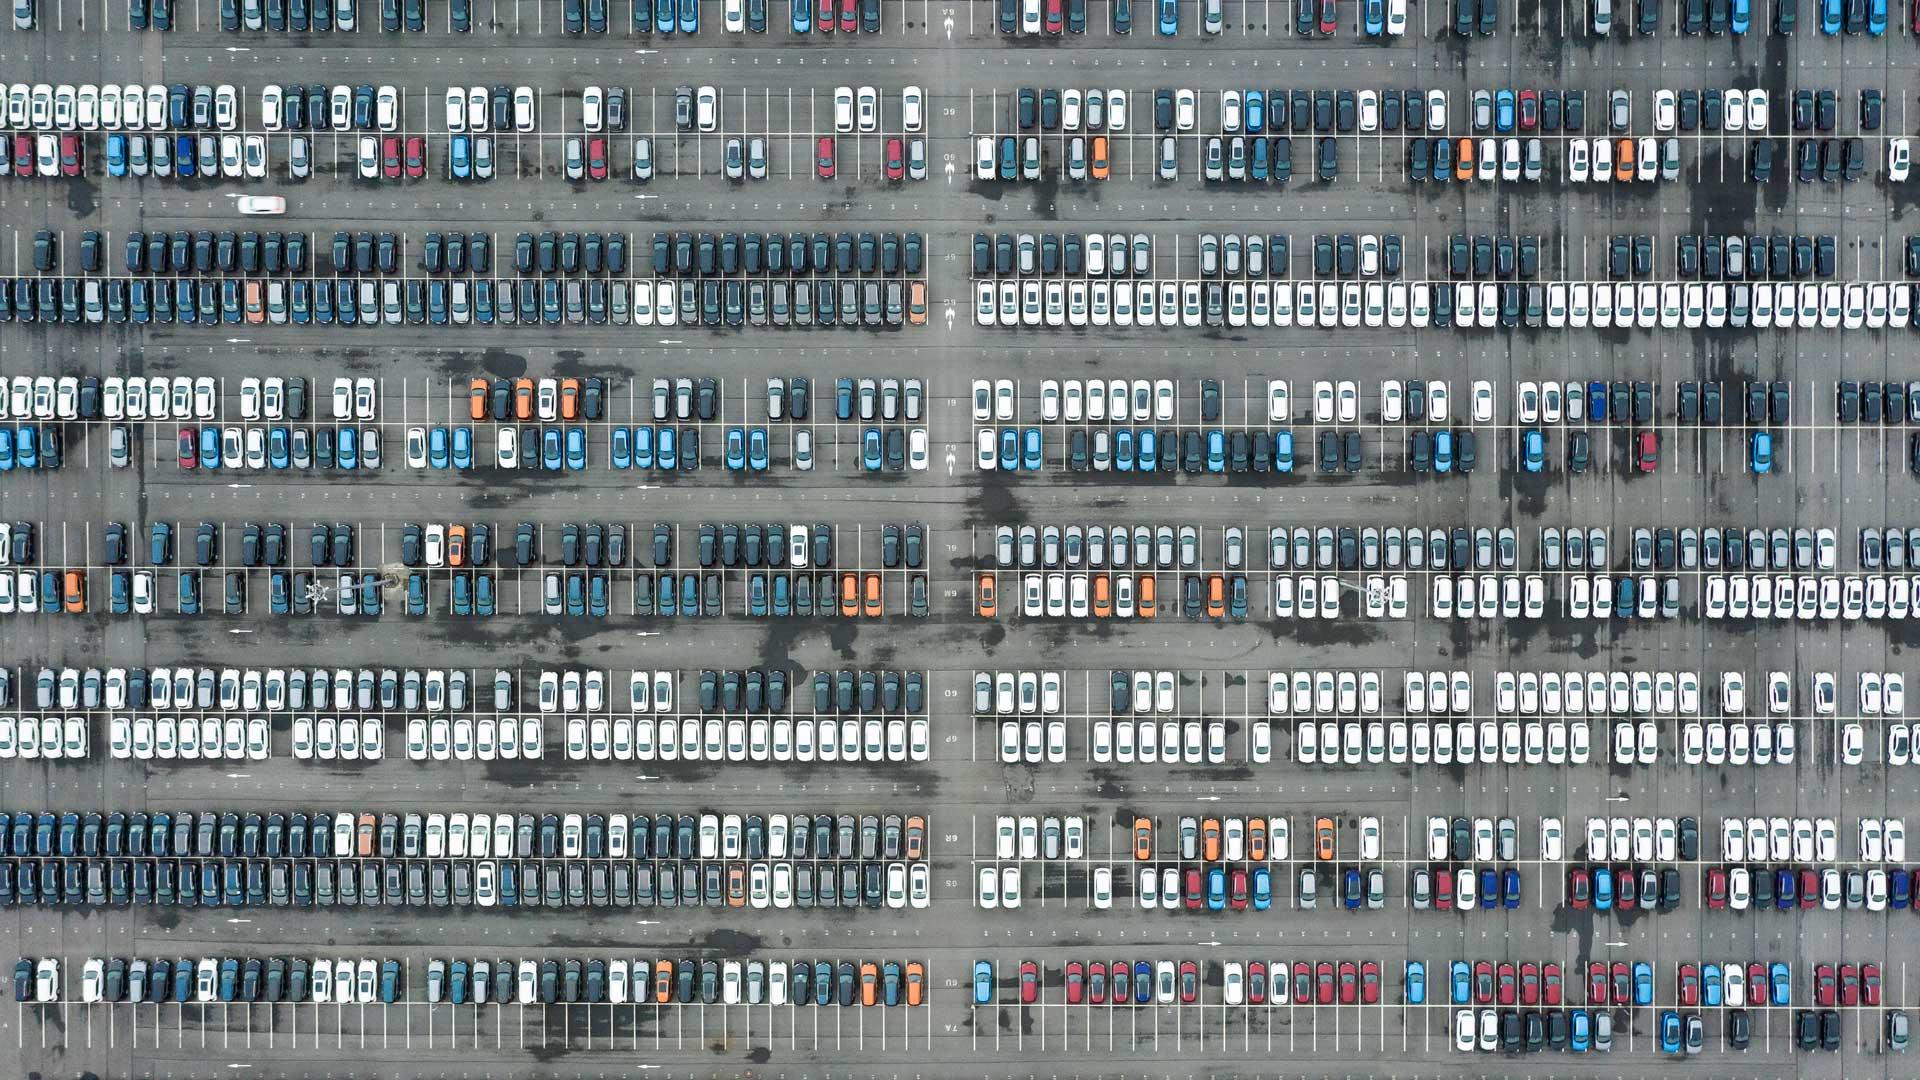 Autoindustrie Corona: Halde von Neuwagen